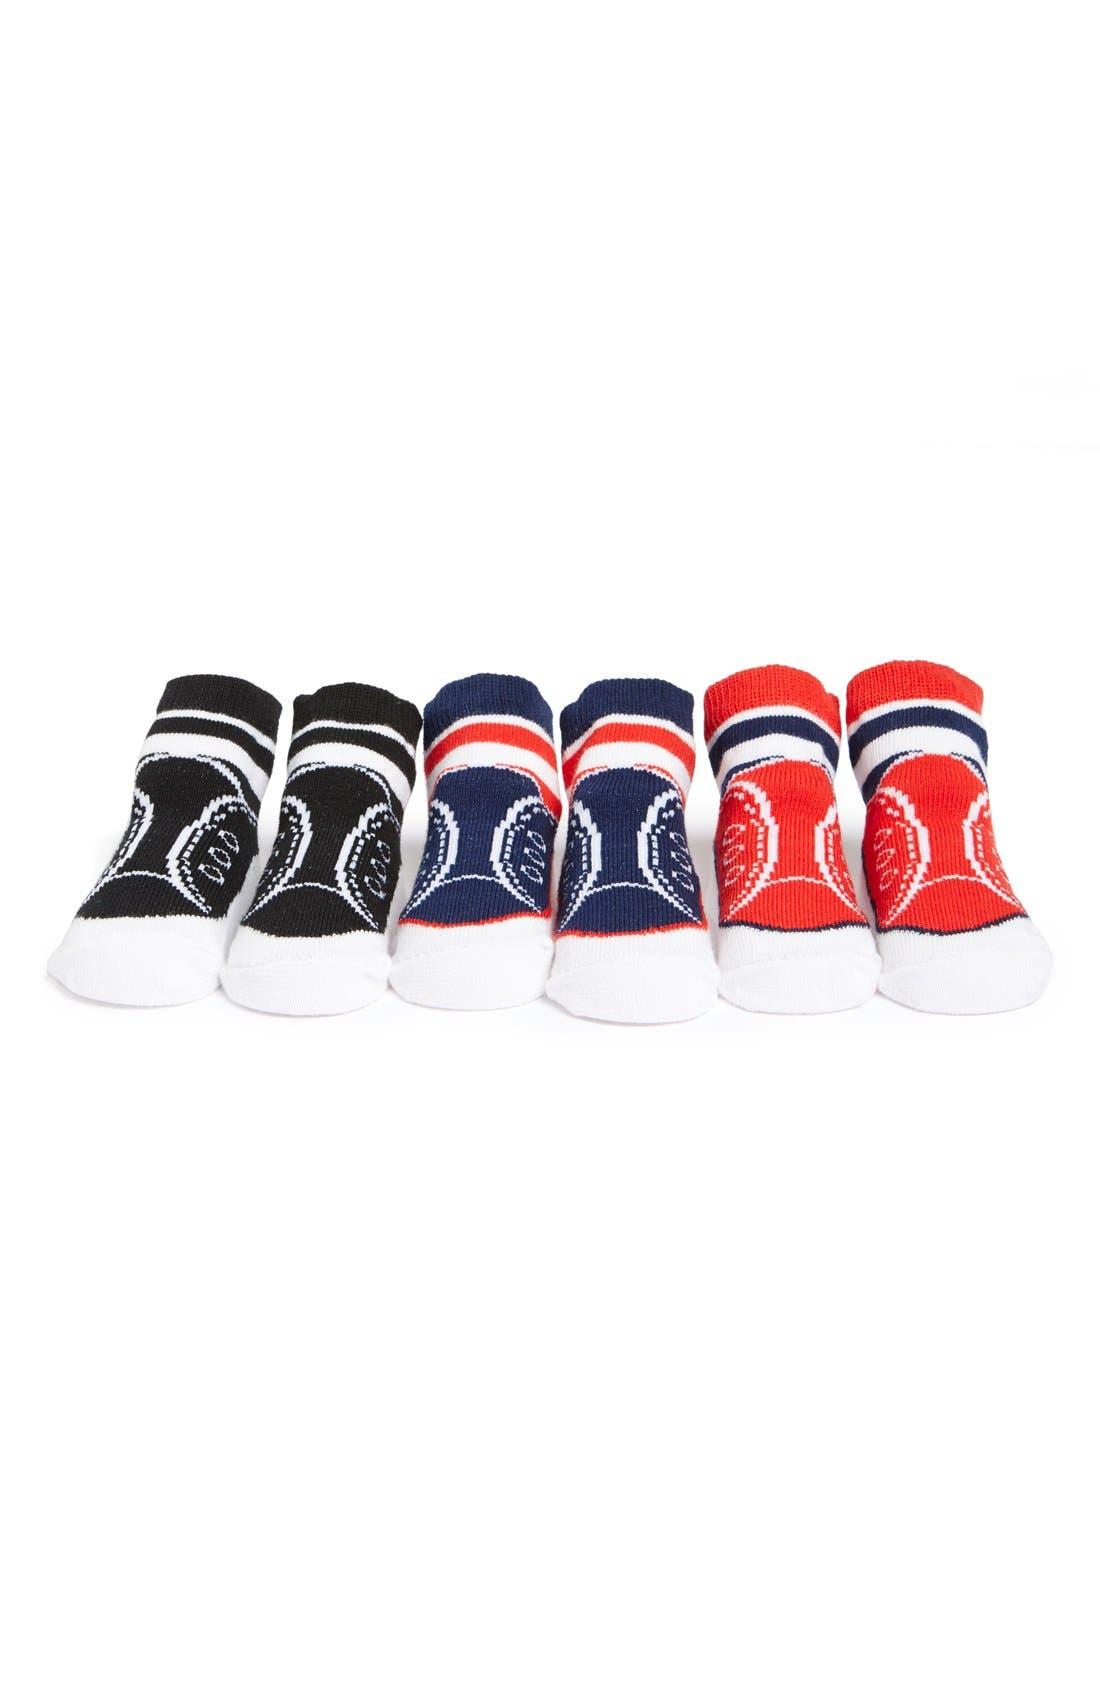 'Sport' Socks,                             Main thumbnail 1, color,                             No Color